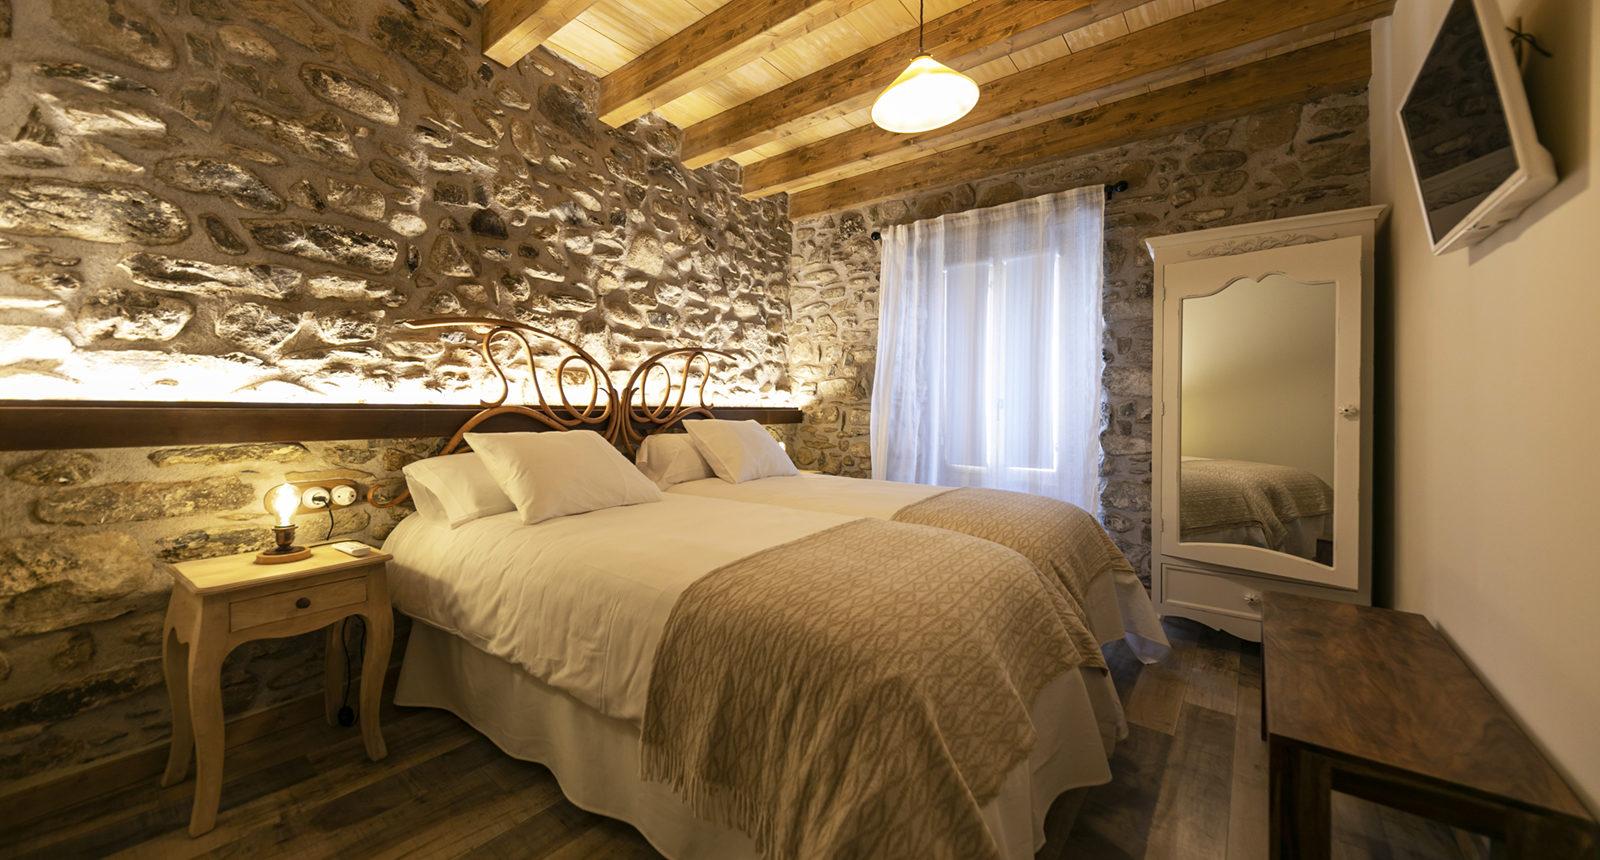 habitación doble con baño36